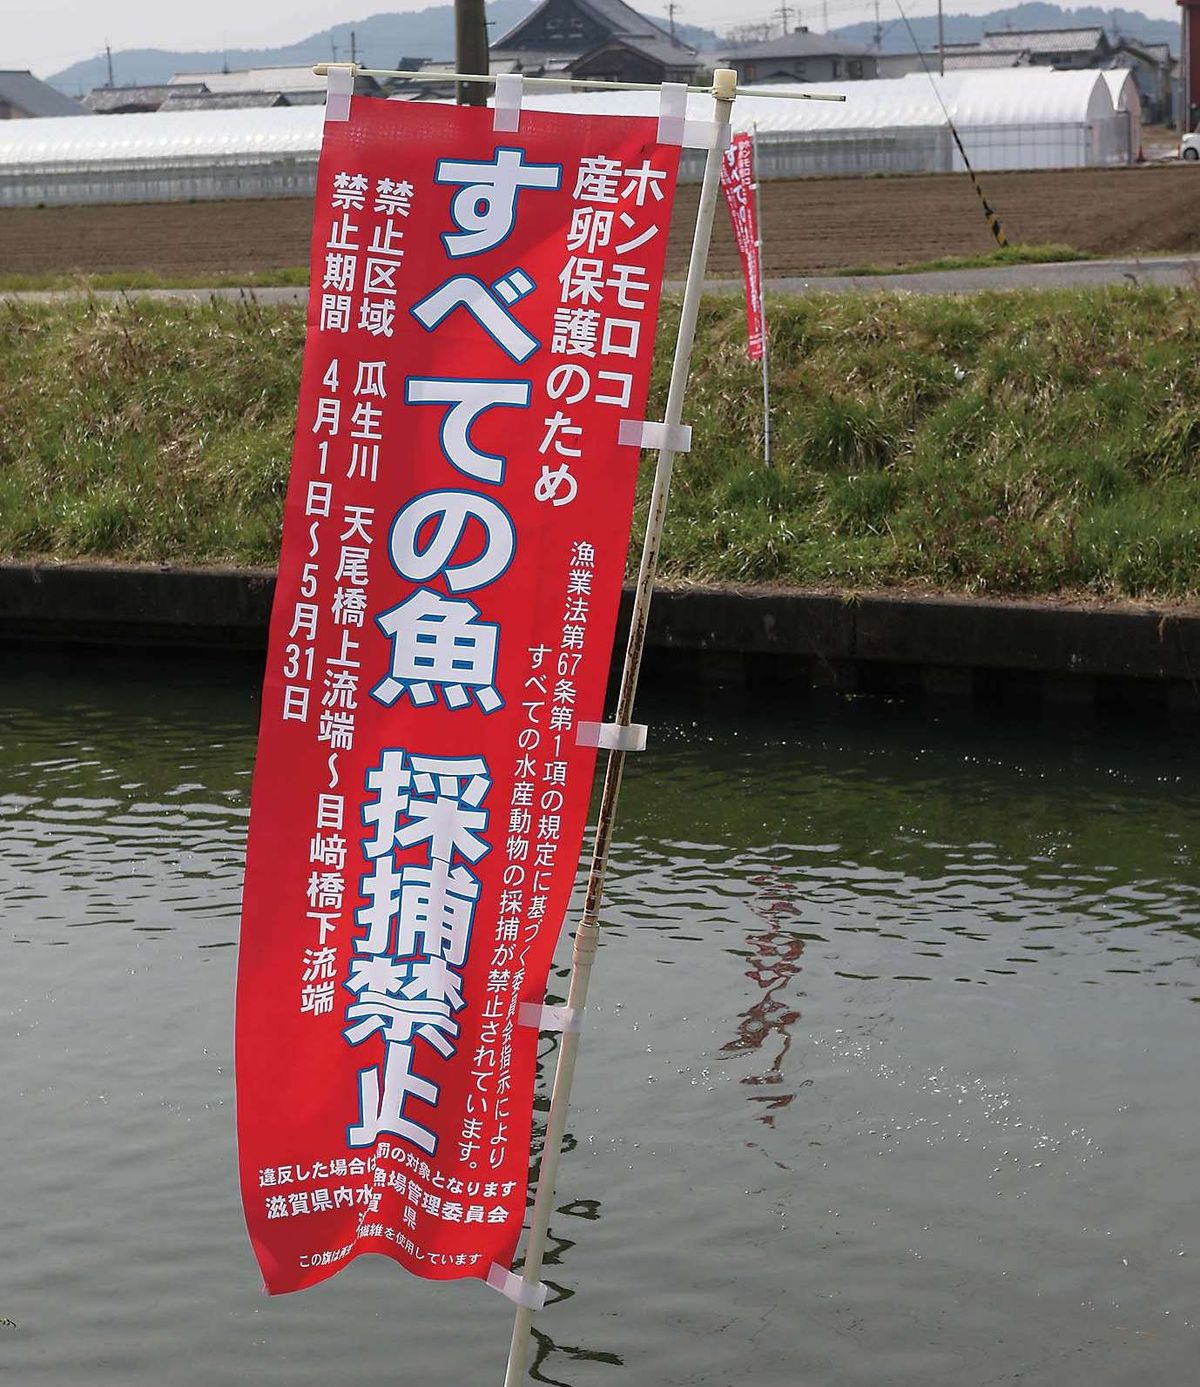 078-101_zenkokutsuribaGW06_cs6 (96)